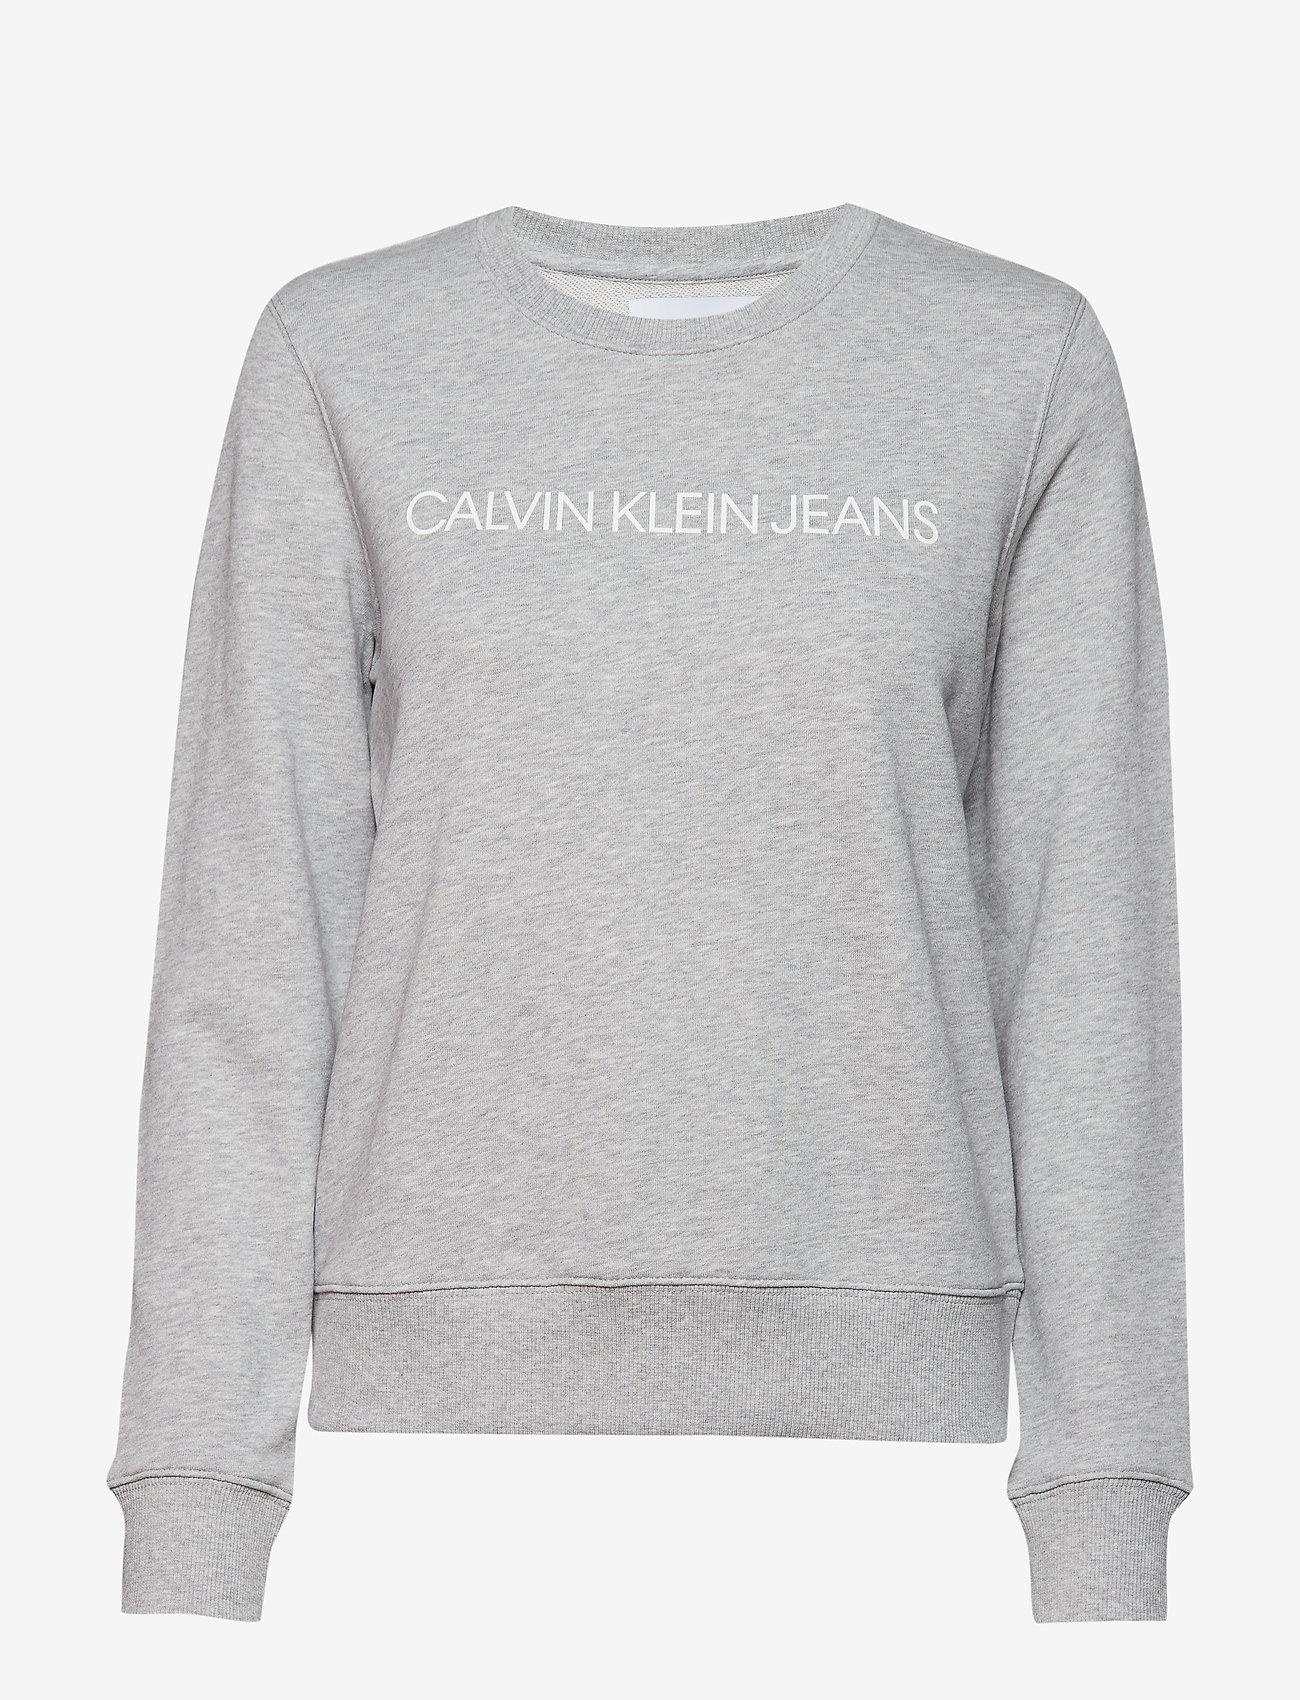 Calvin Klein Jeans - INSTITUTIONAL CORE L - sweatshirts - light grey heather - 0